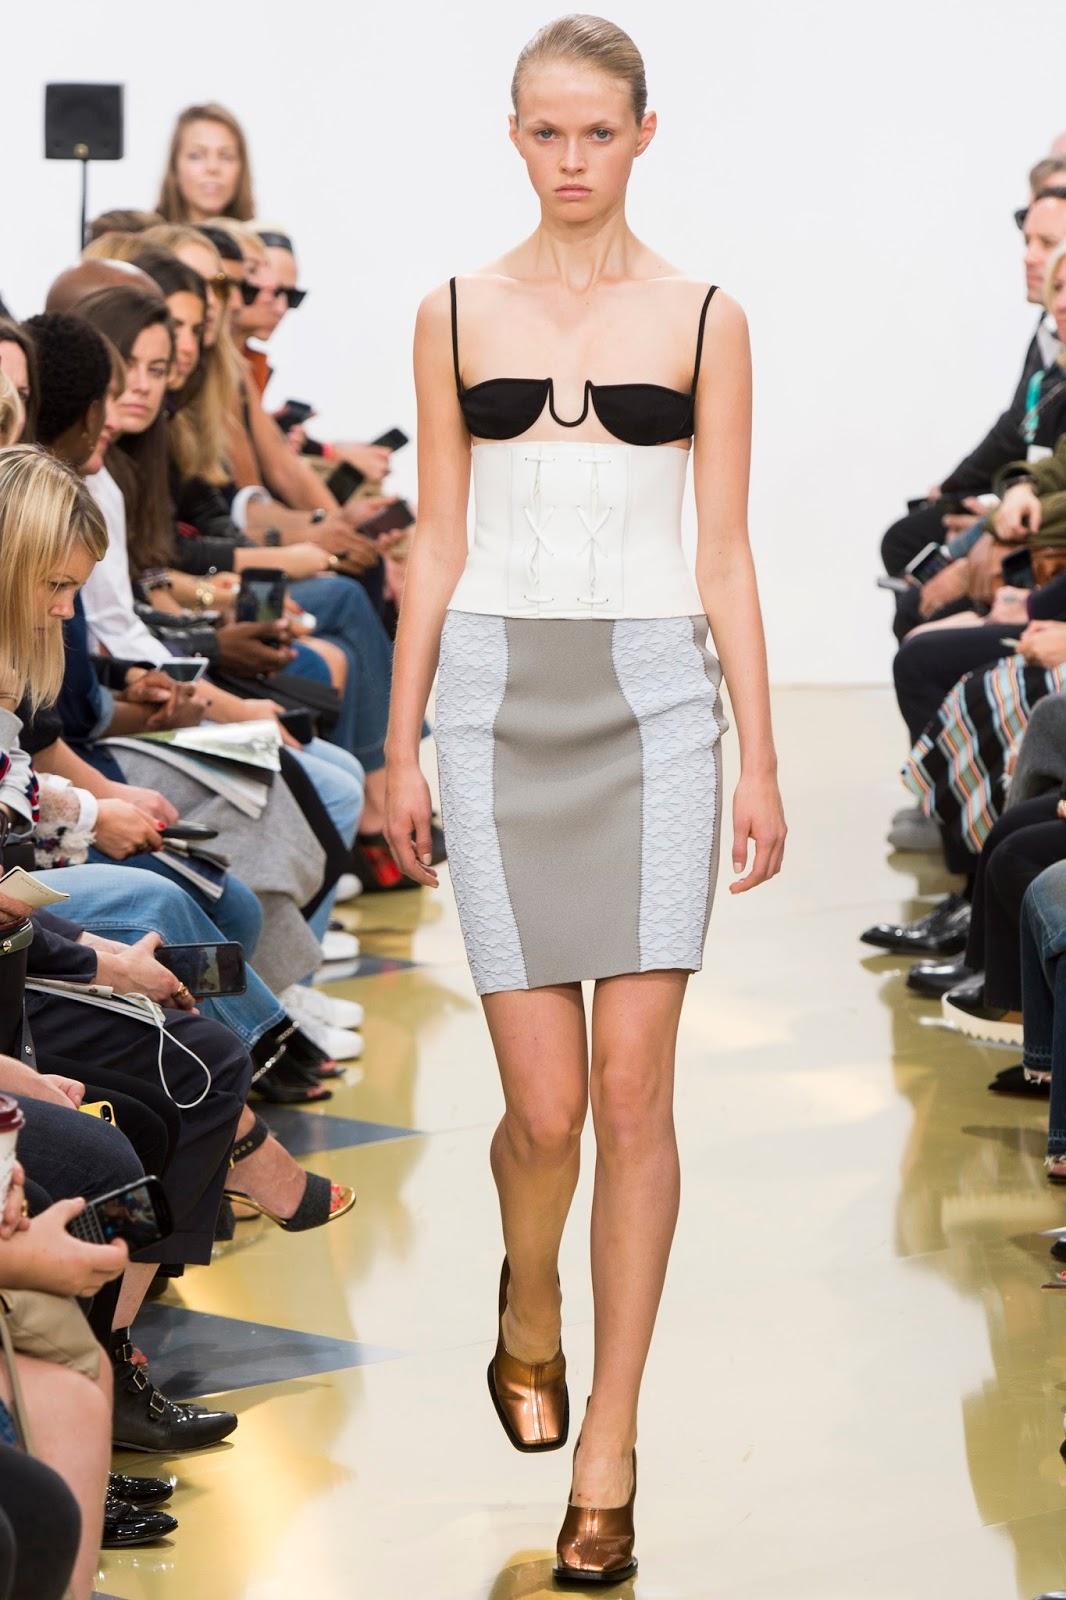 lfw spring 2016, London Fashion Week, model, catwalk, pencil skirt, designer